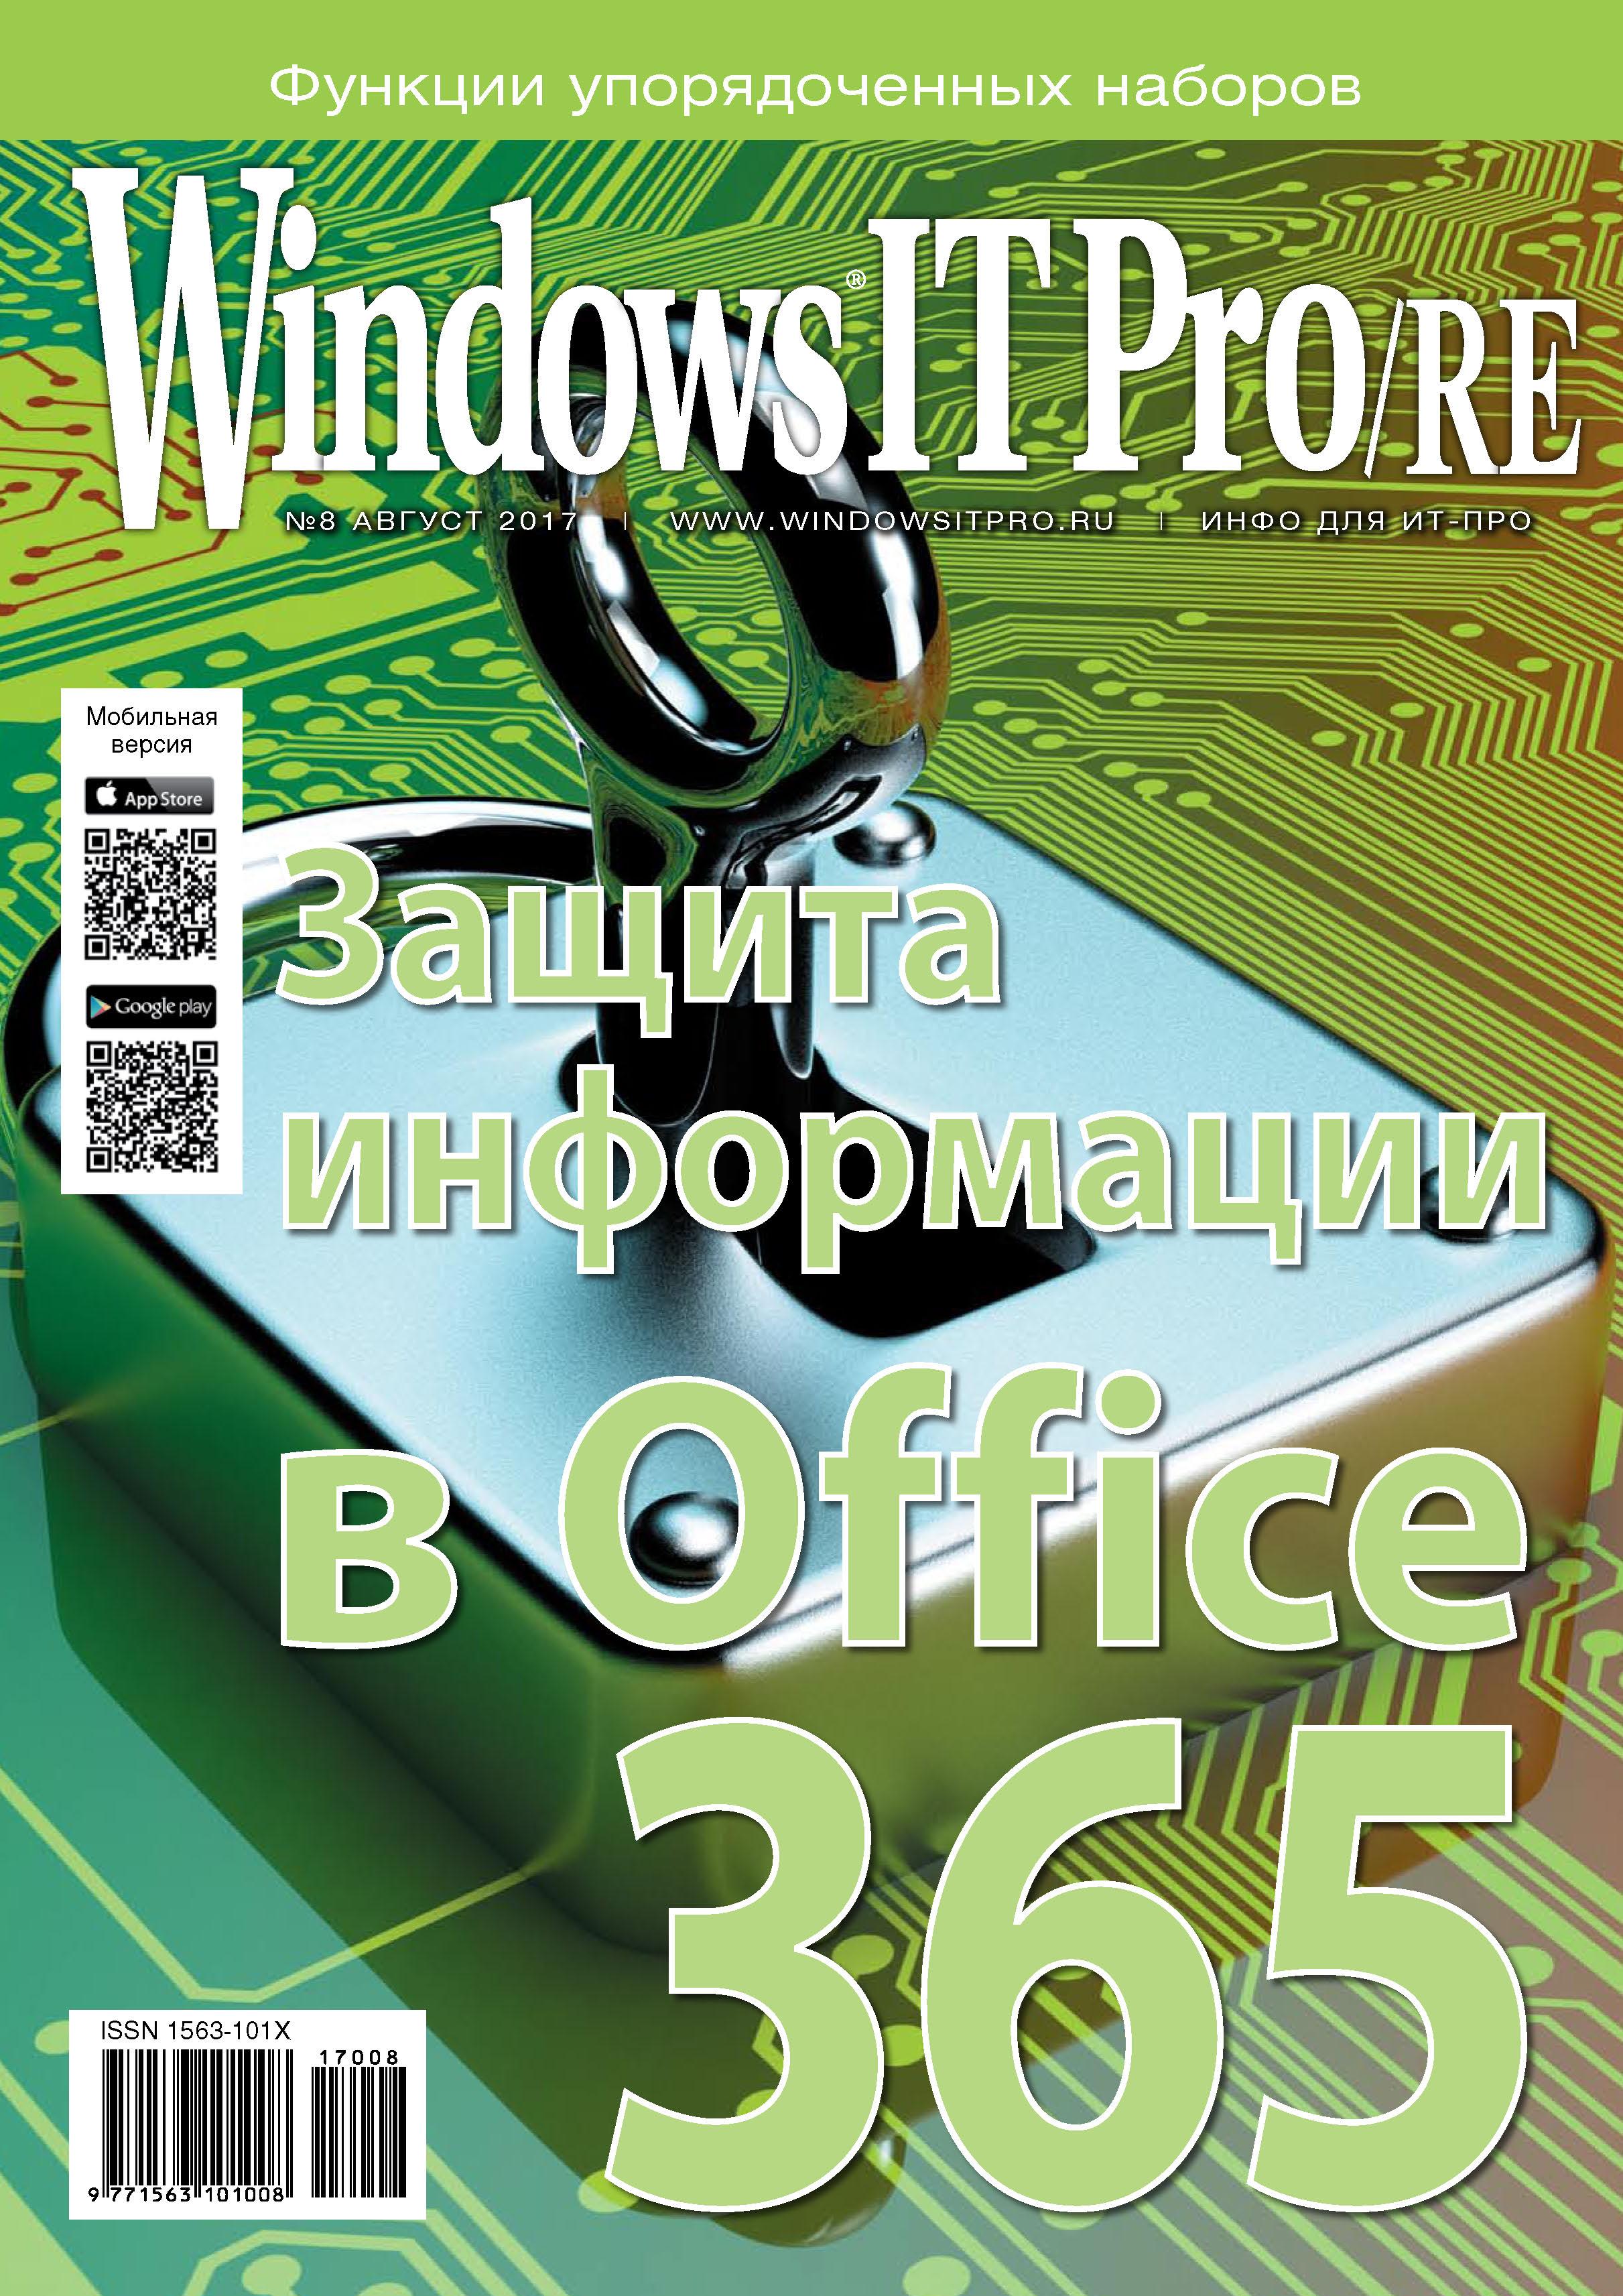 Открытые системы Windows IT Pro/RE №08/2017 microsoft office 365 personal для windows macos и ios box